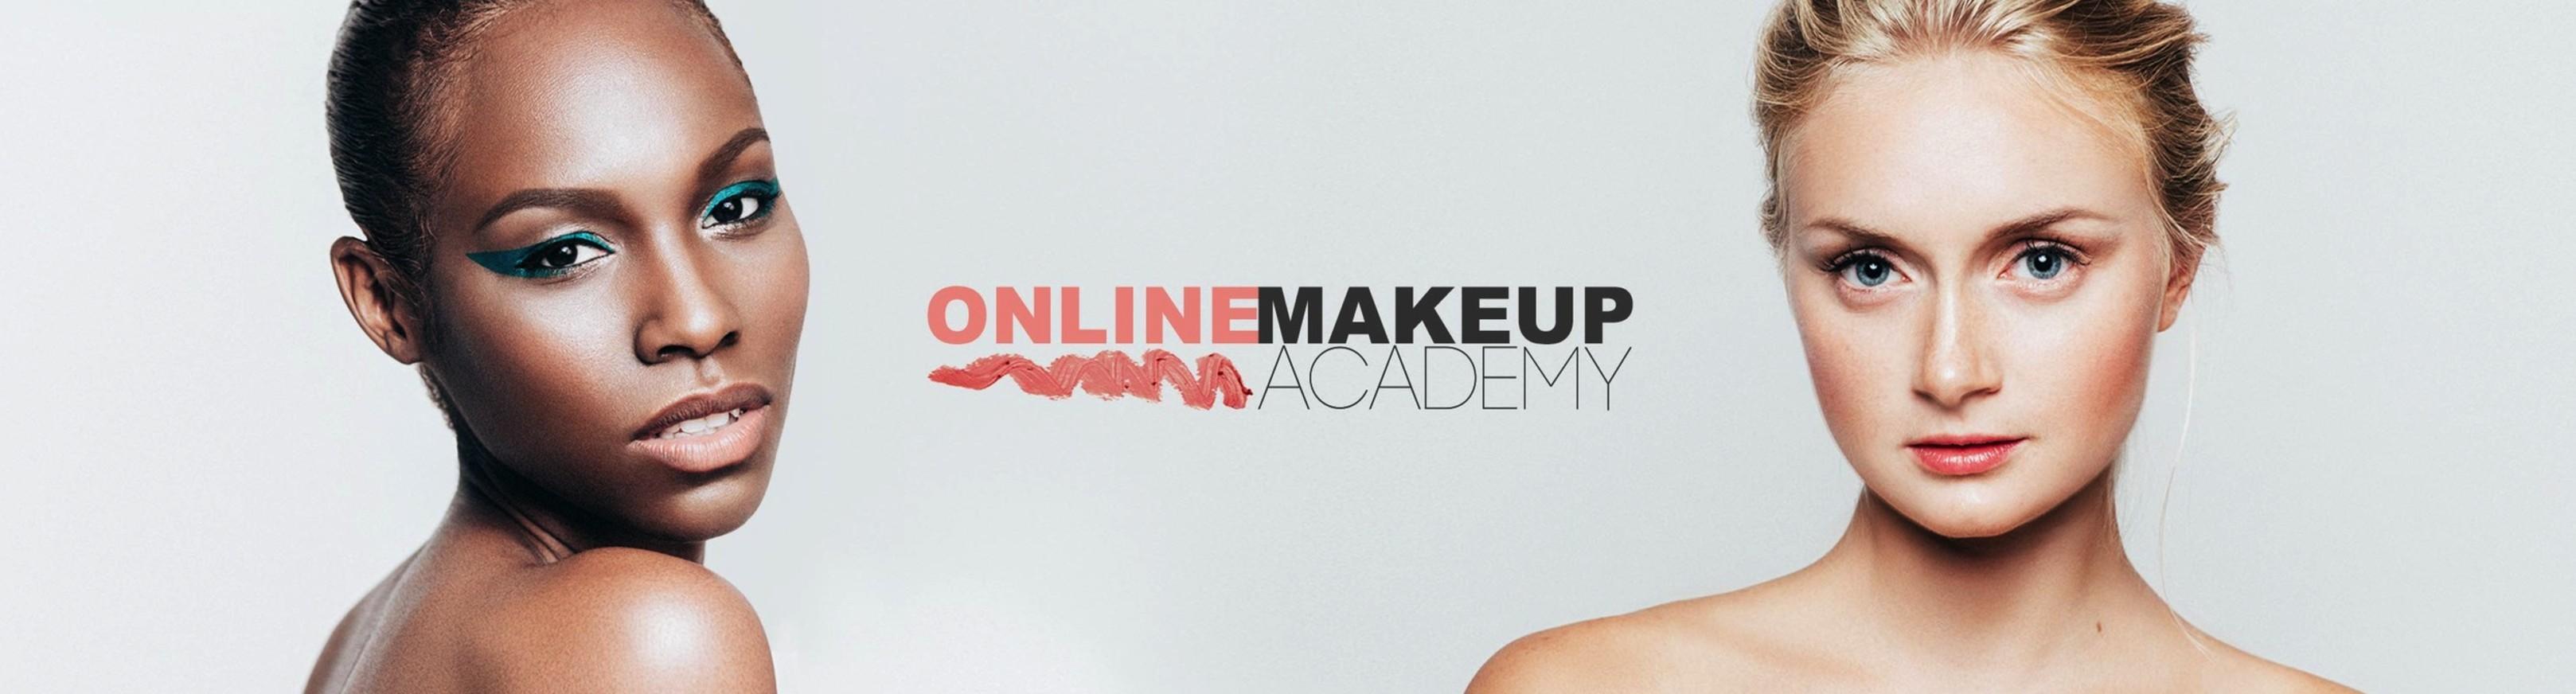 Online Makeup Academy Linkedin